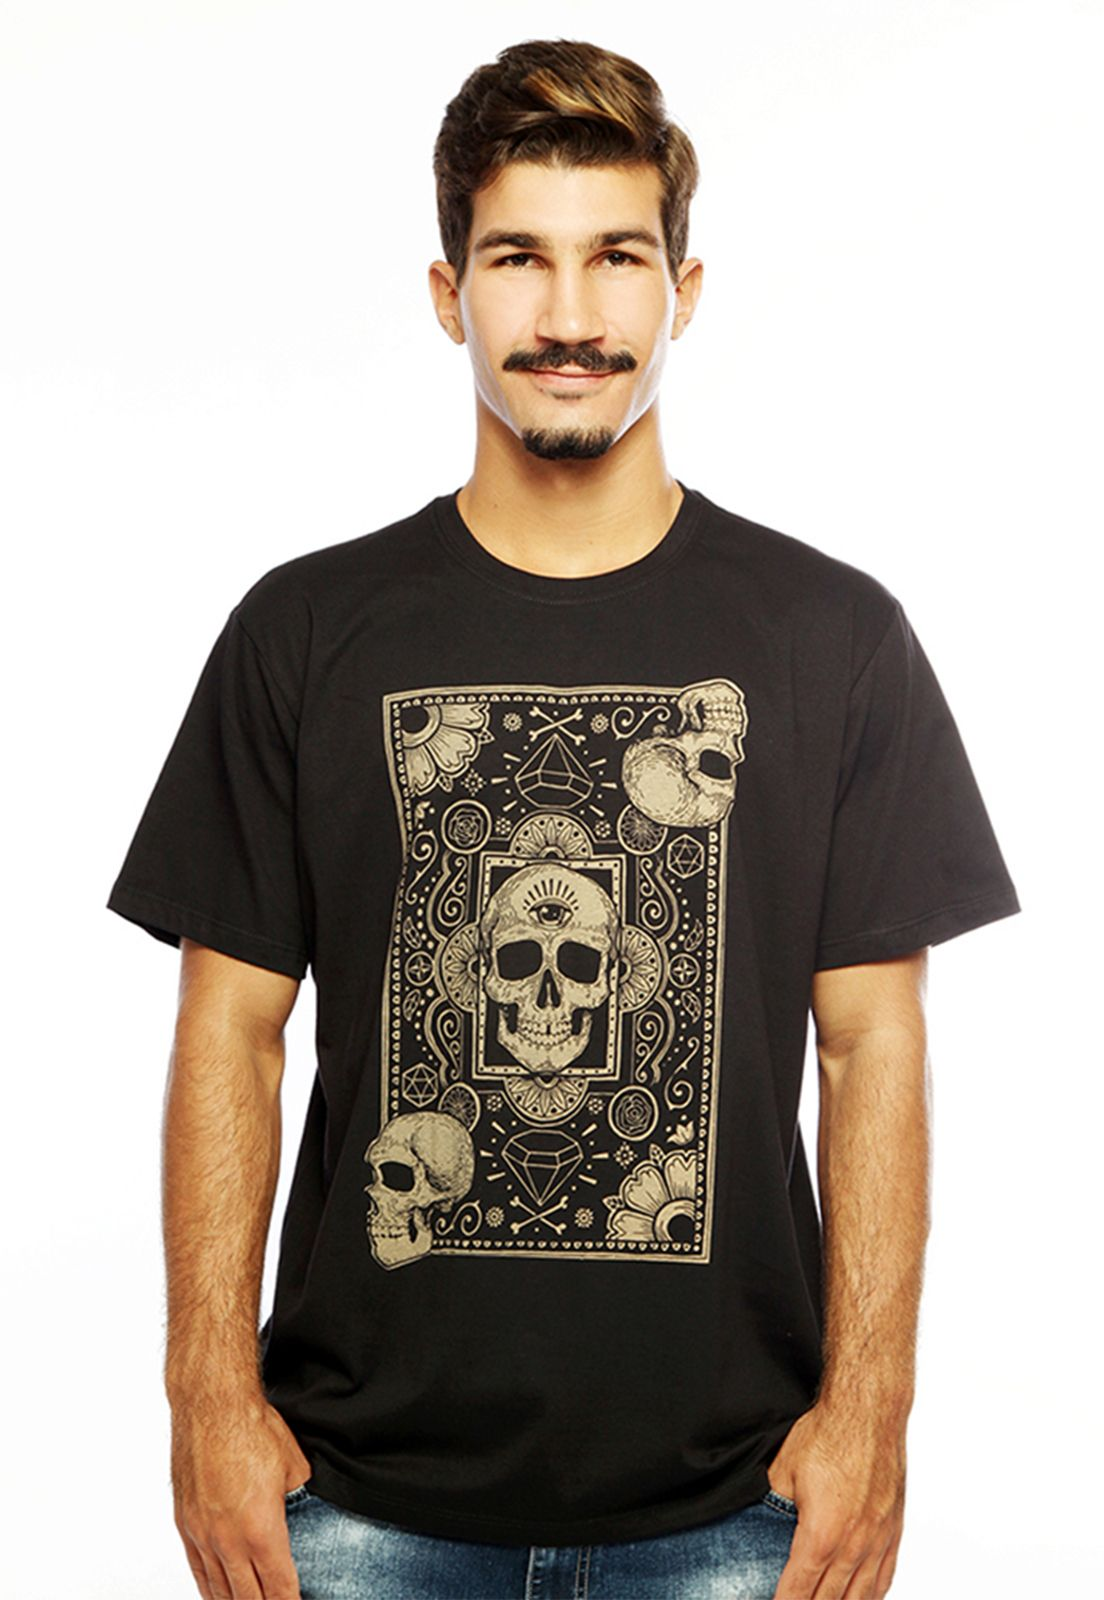 Camiseta Hardivision Cards of Skull Manga Curta Preto